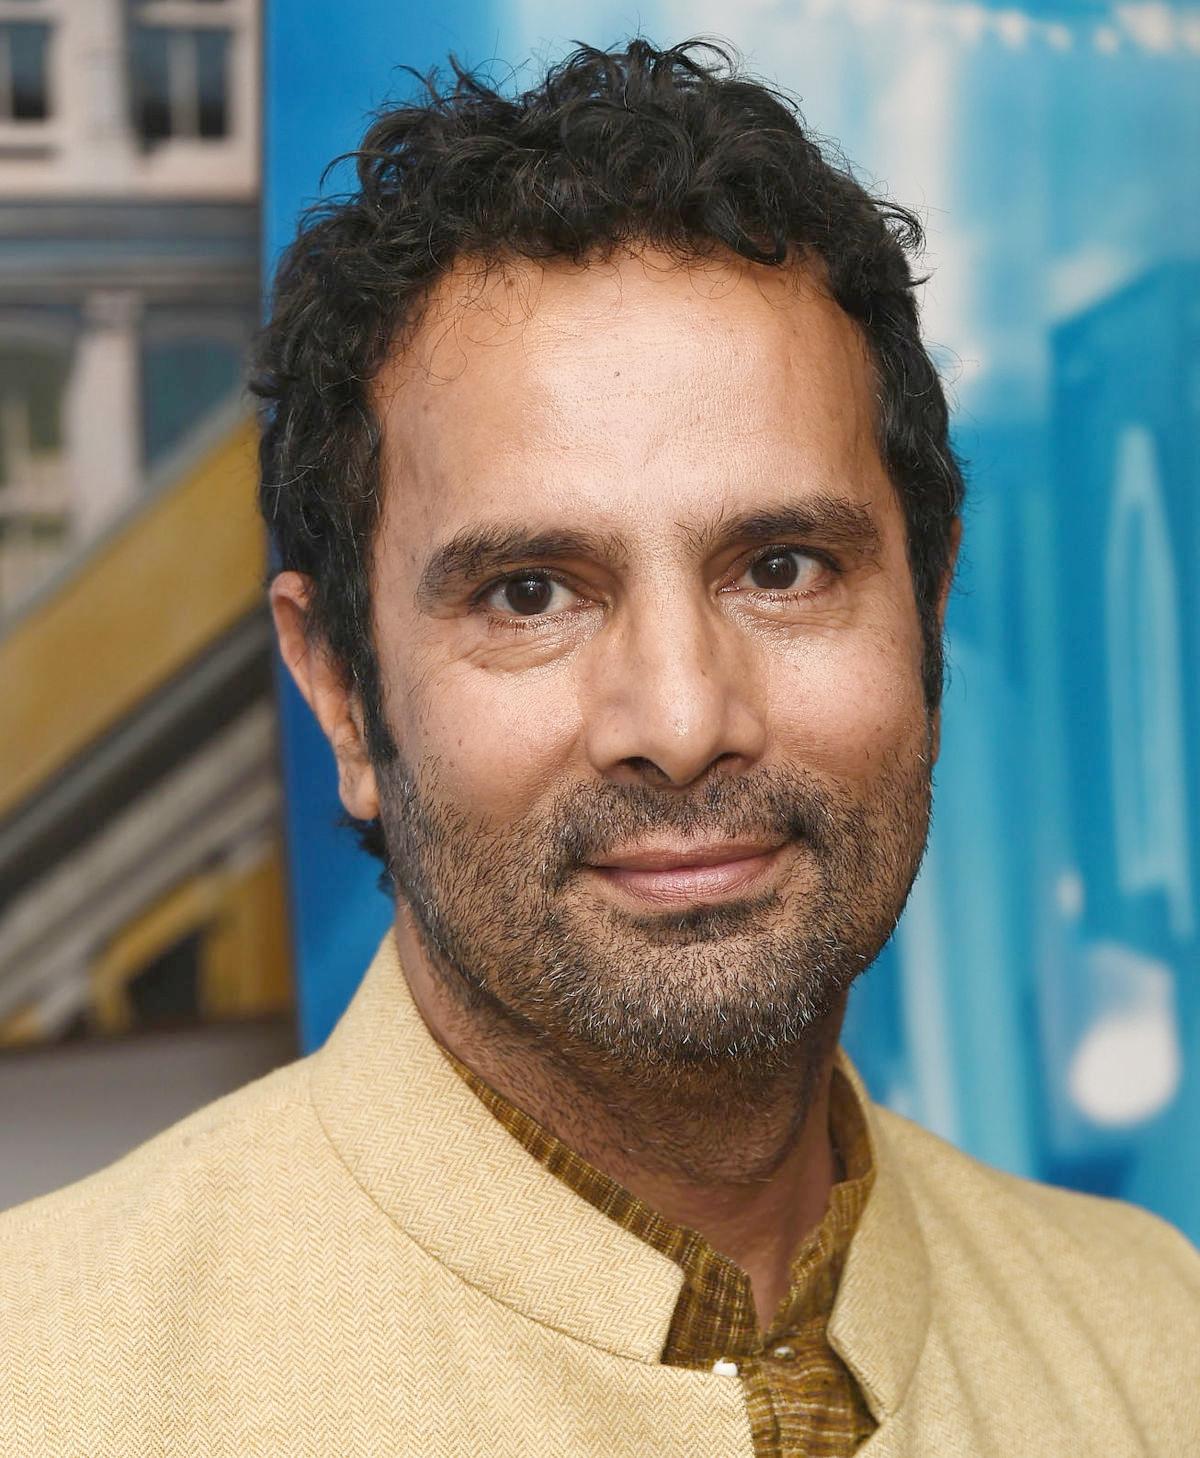 Tarsem Singh - Film Director